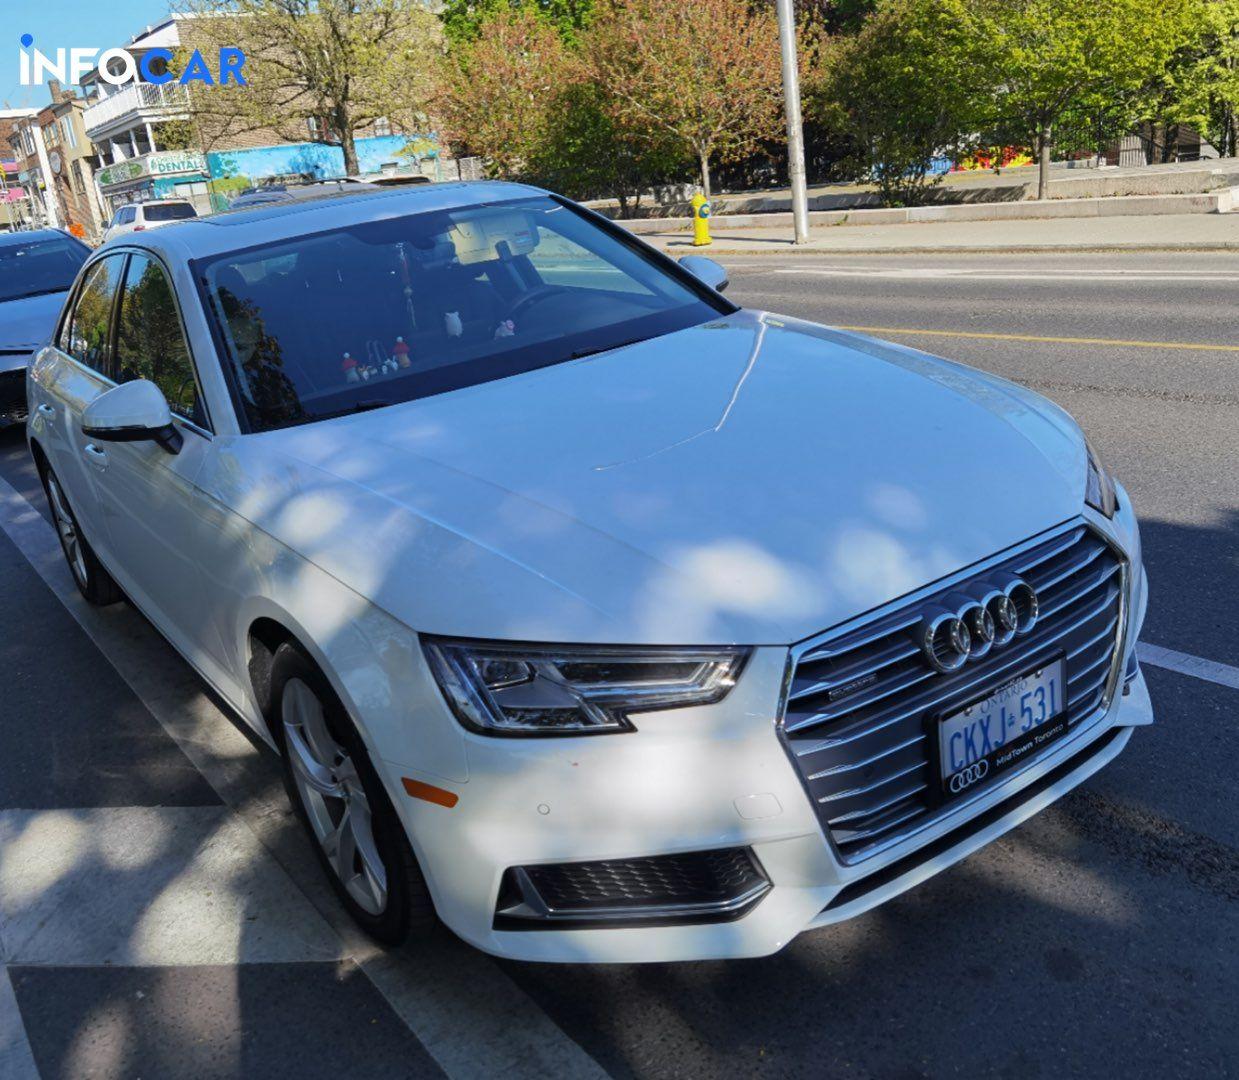 2019 Audi A4 progressiv - INFOCAR - Toronto's Most Comprehensive New and Used Auto Trading Platform